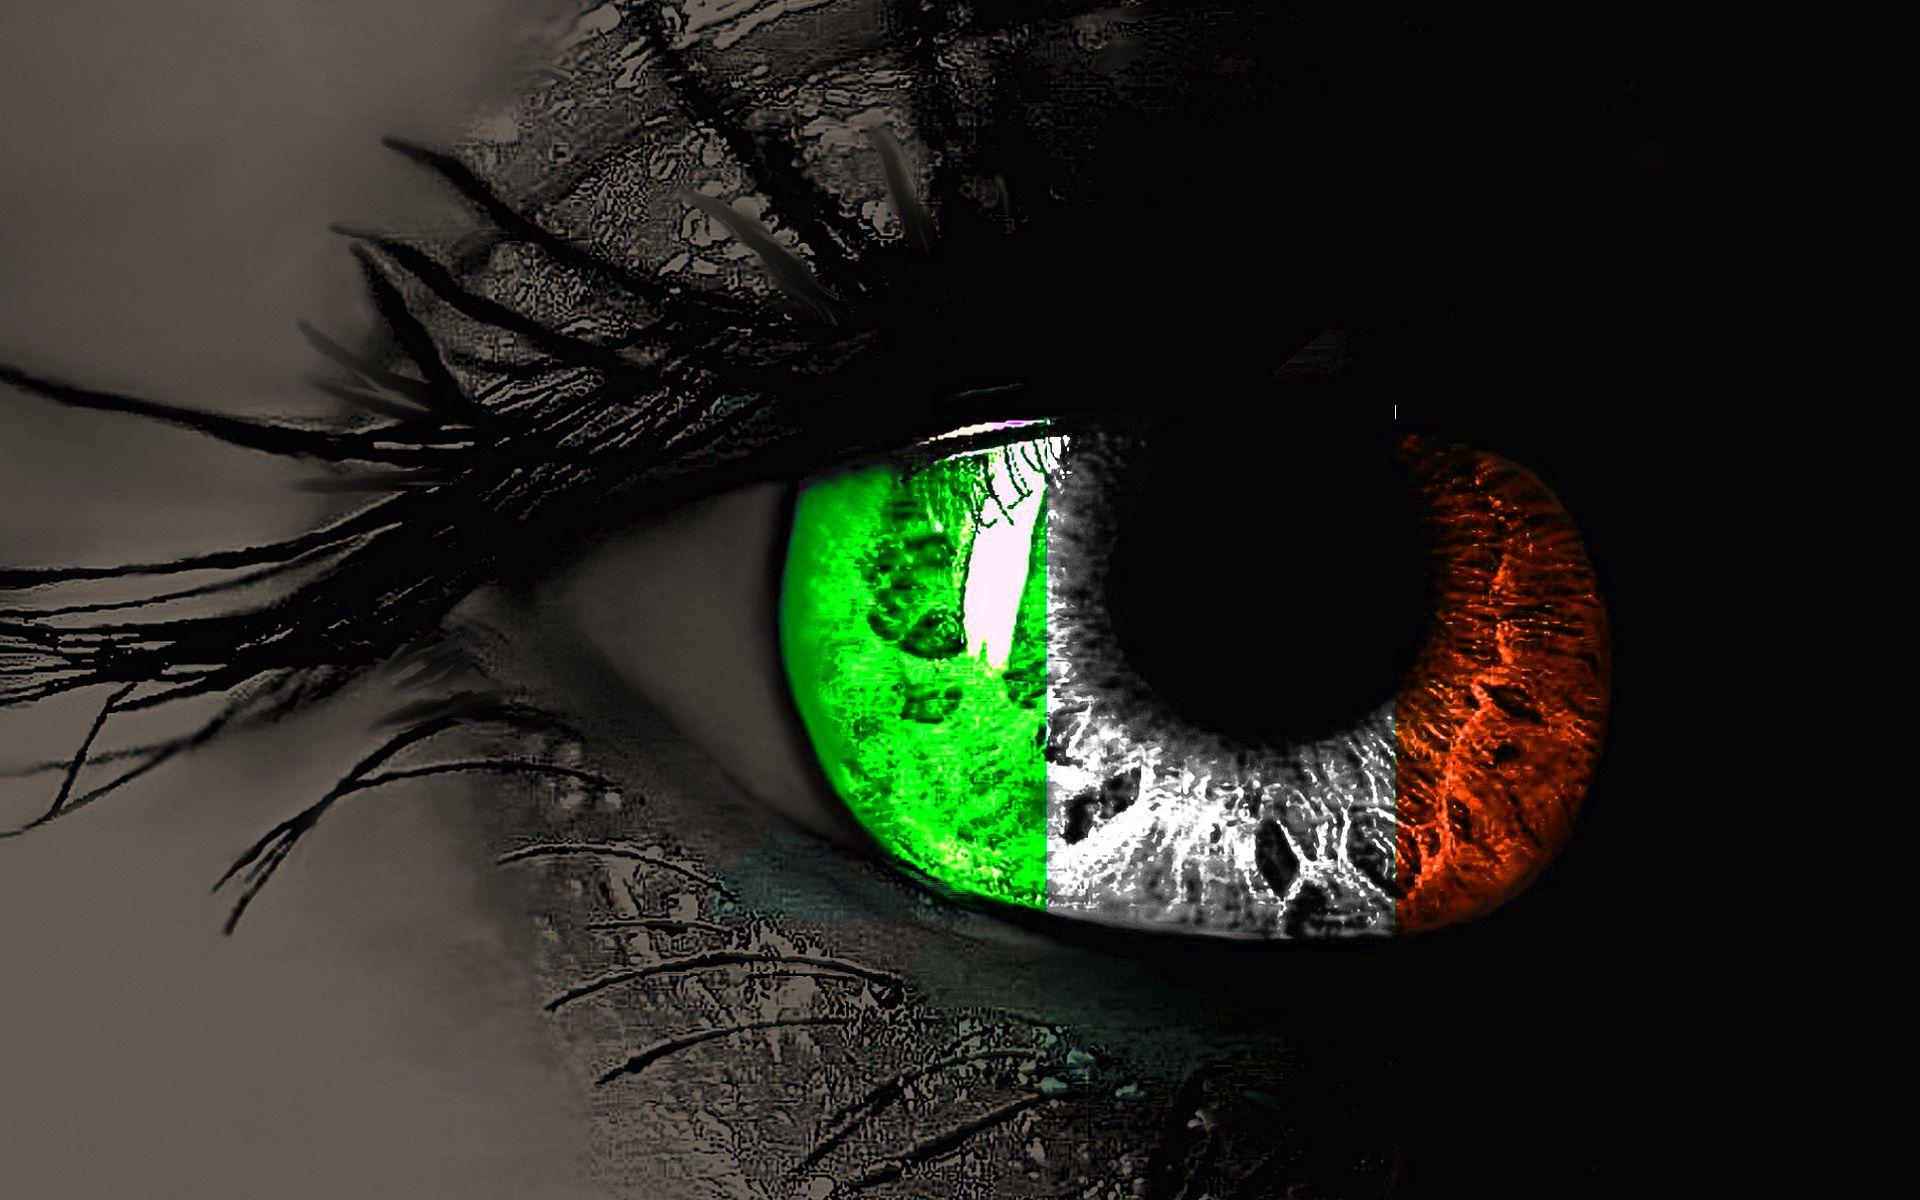 amazing irish flag in eyes hd wallpaper for desktop background 1920x1200